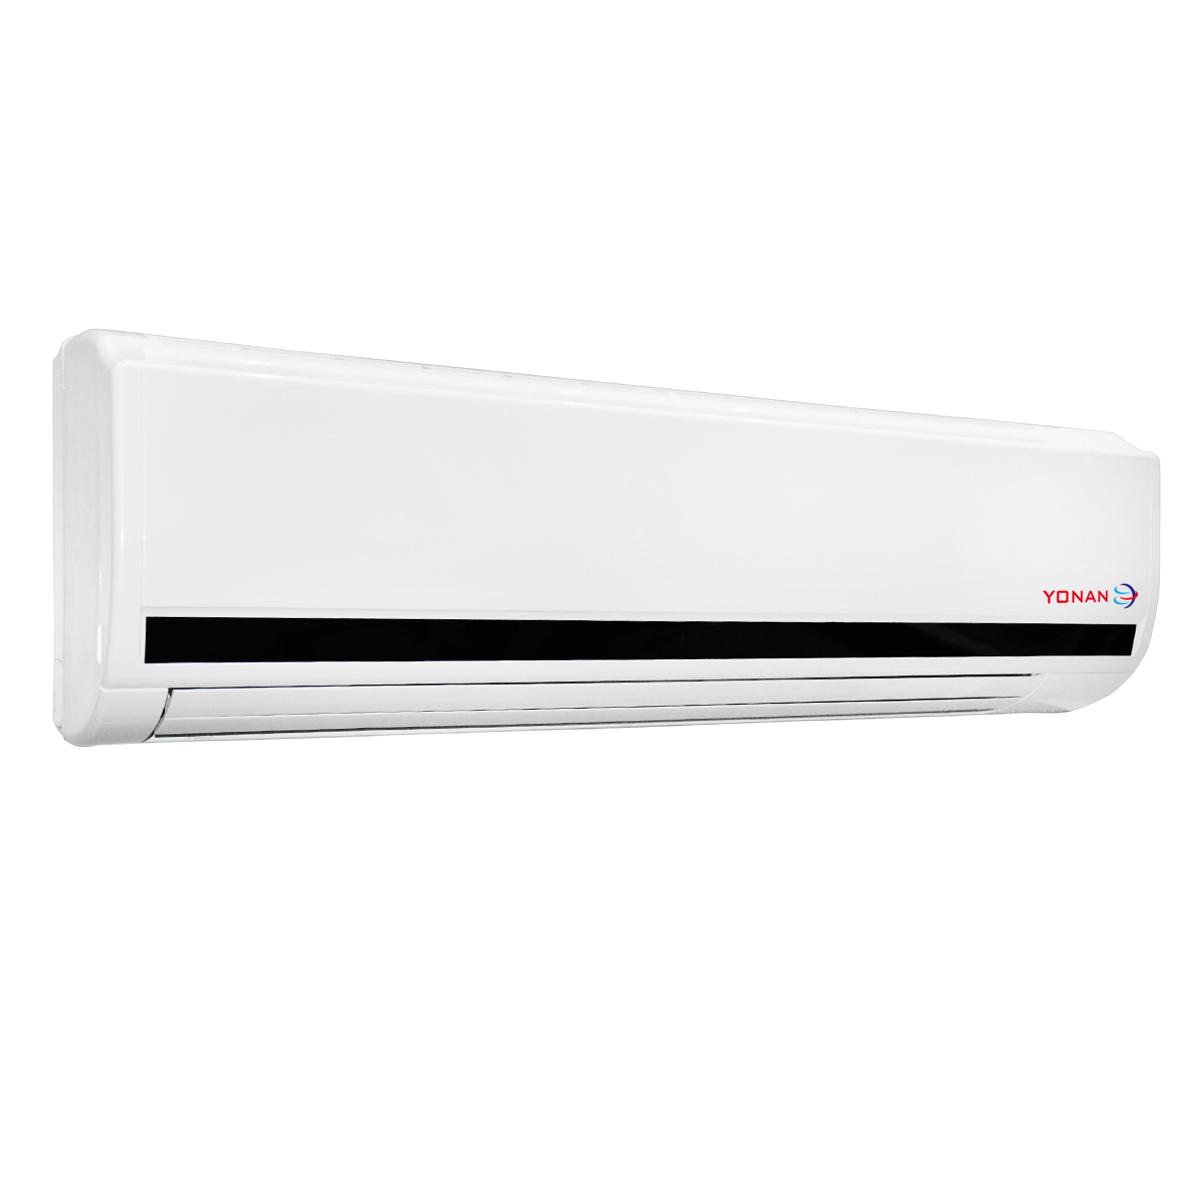 AIR CONDITIONER Split Wall Air Conditioner 18000 BTU